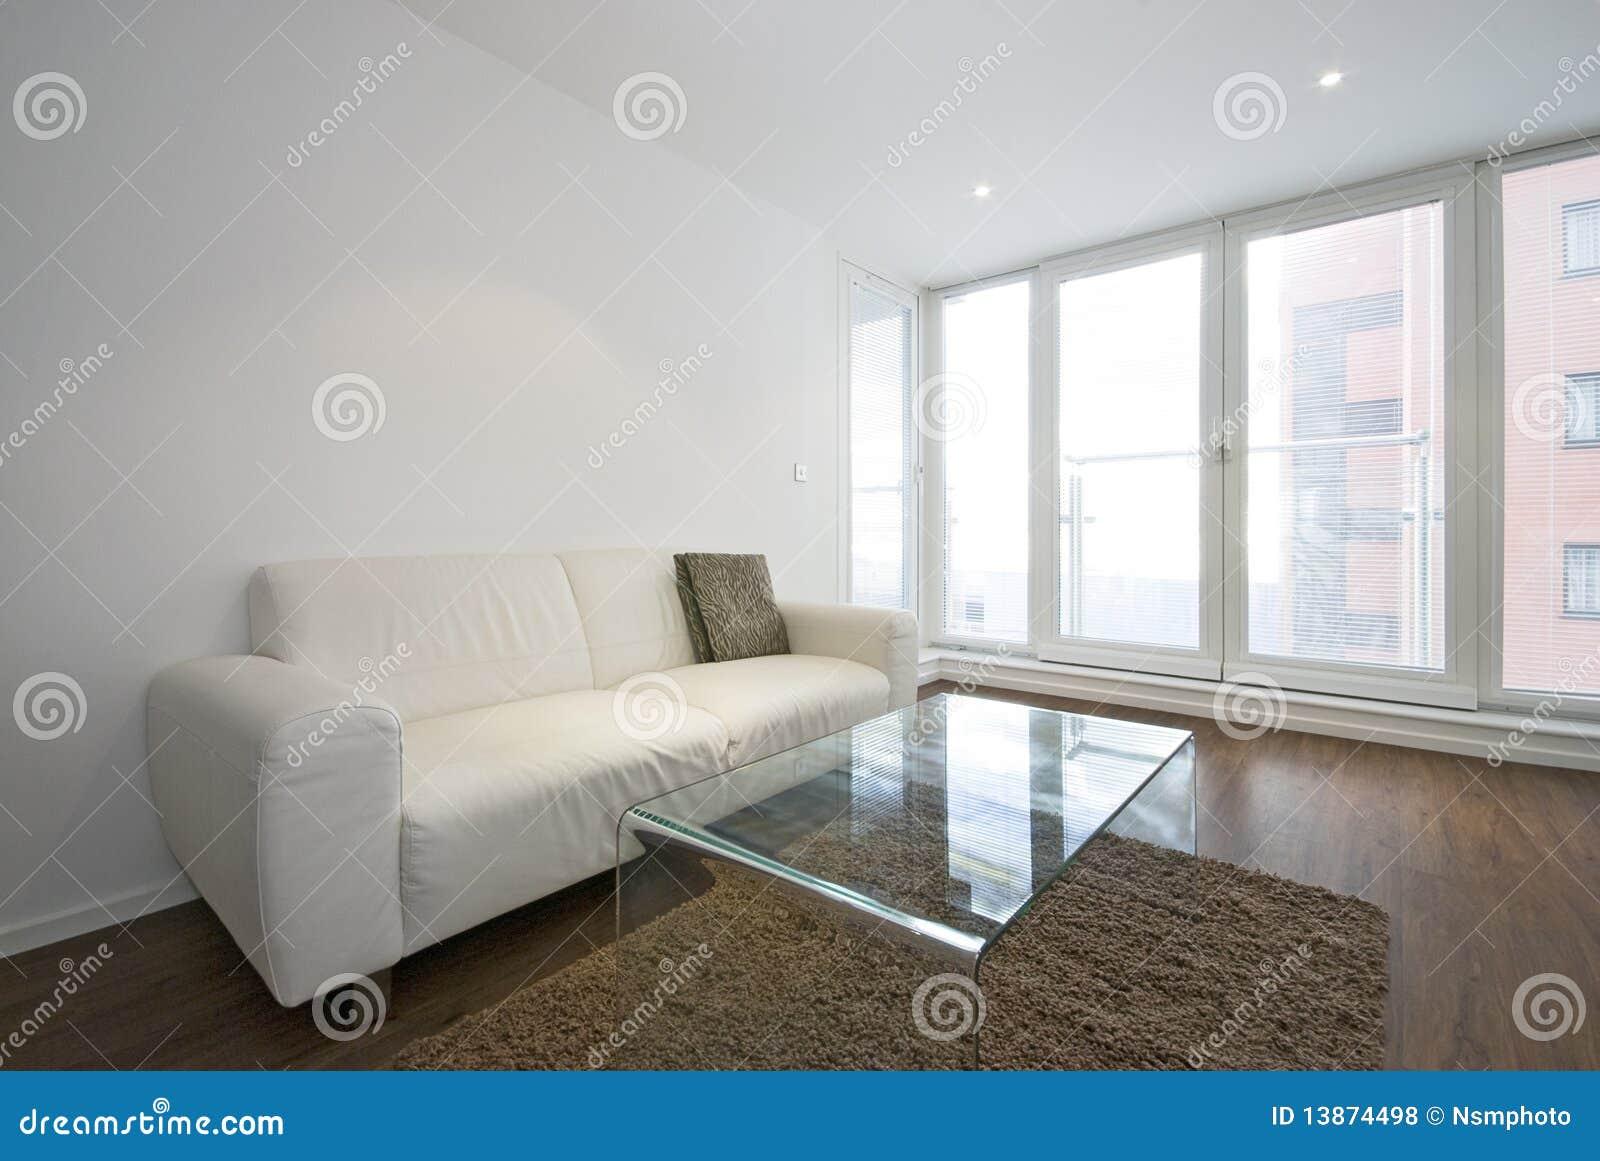 Moderne woonkamer wit ~ artikill.com